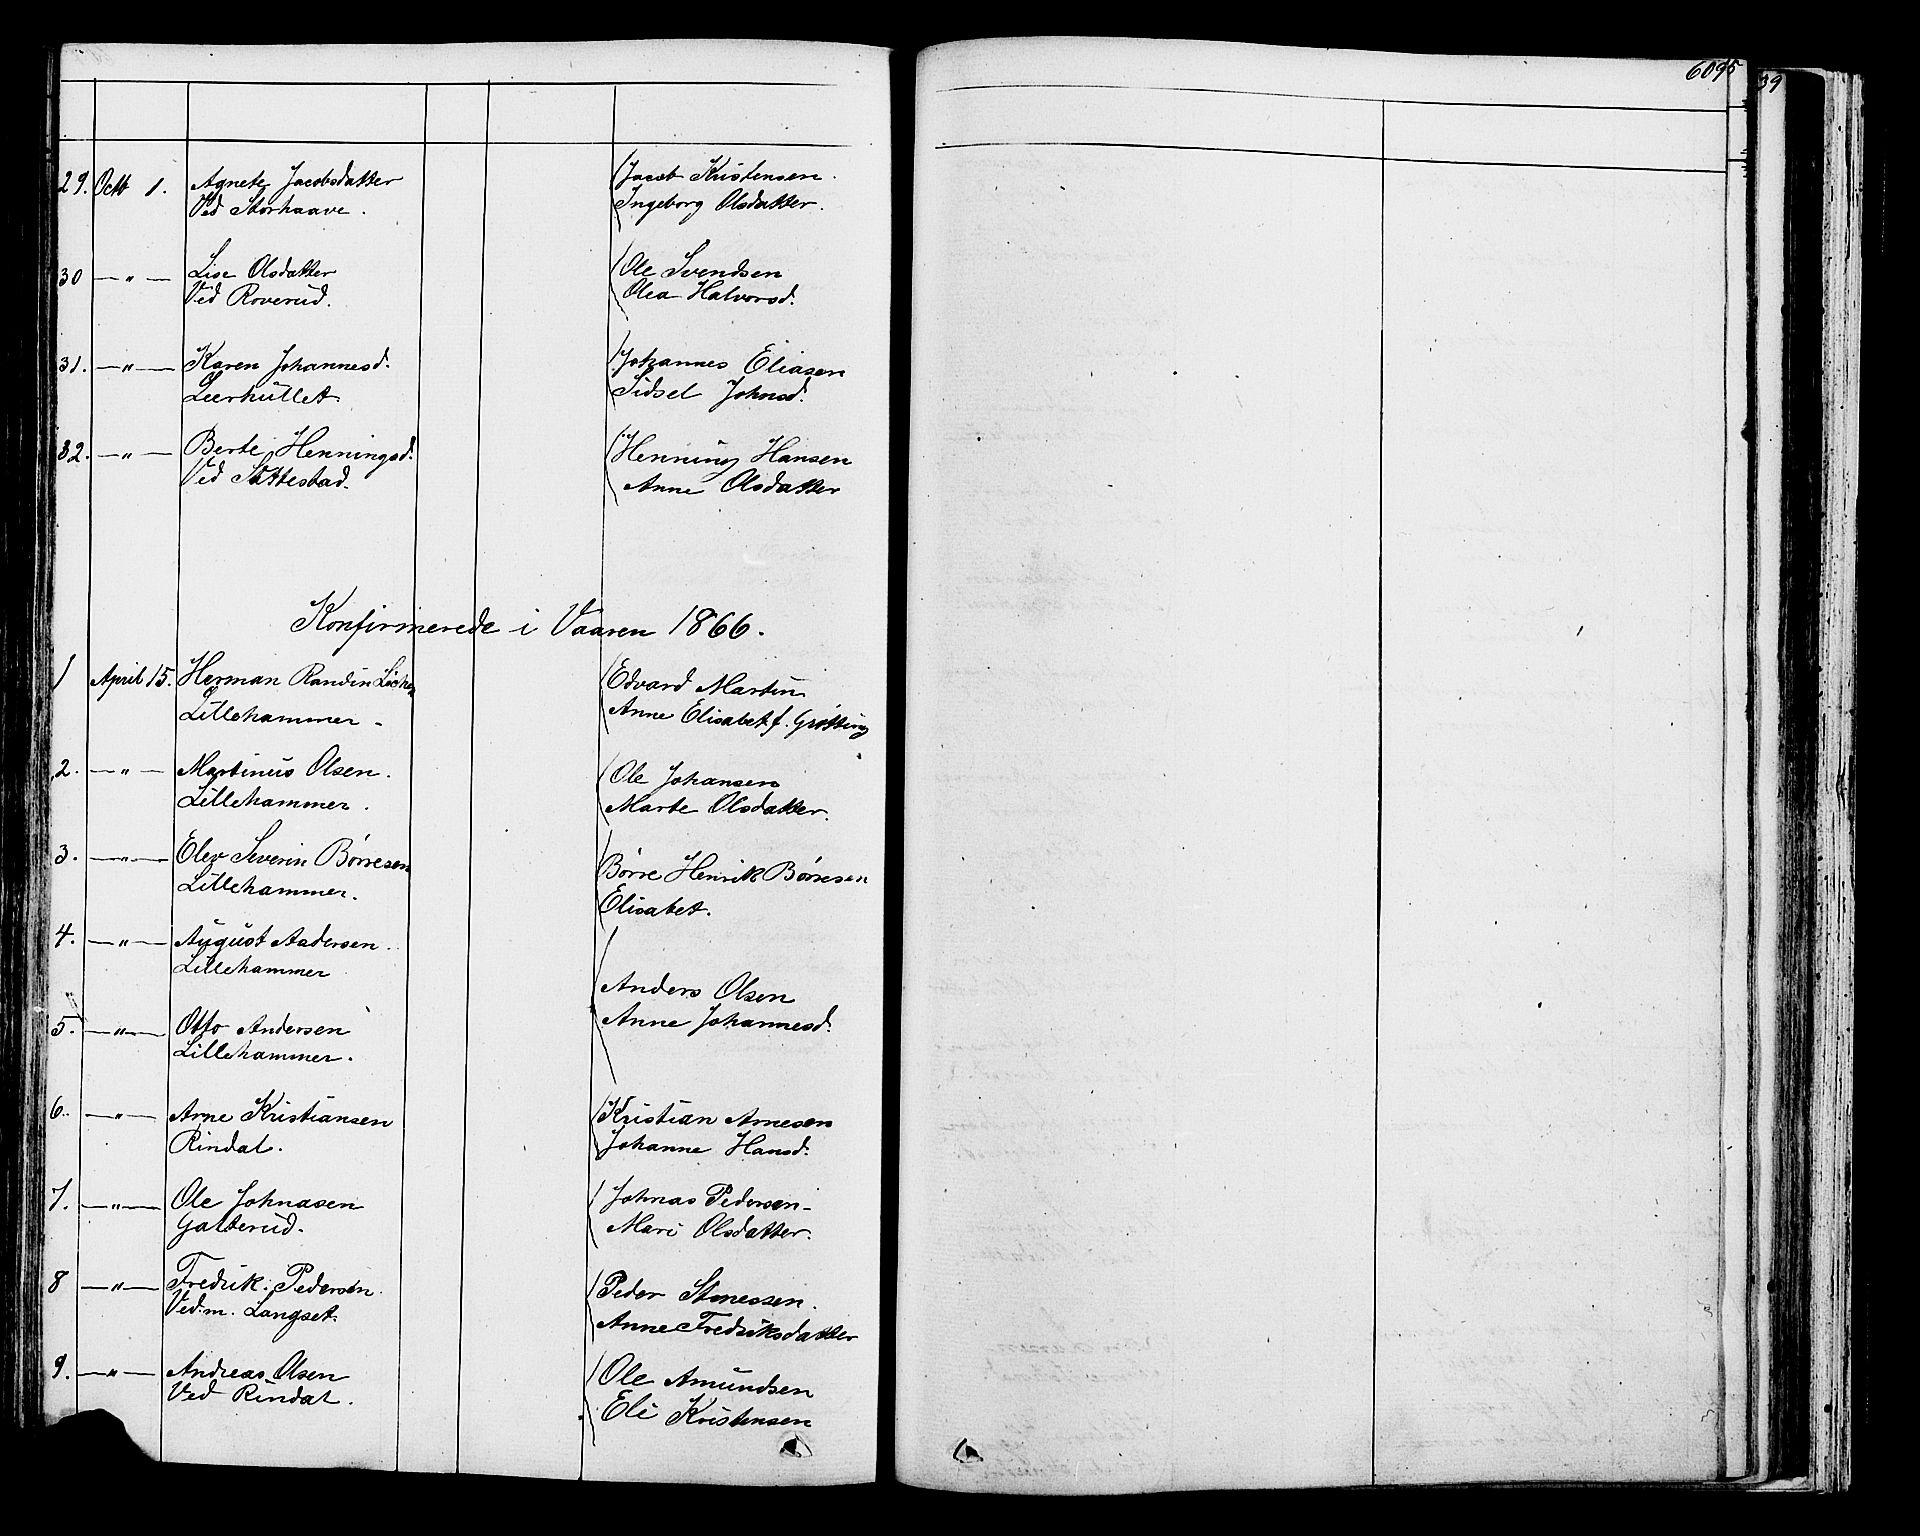 SAH, Fåberg prestekontor, Klokkerbok nr. 7, 1856-1891, s. 608-609